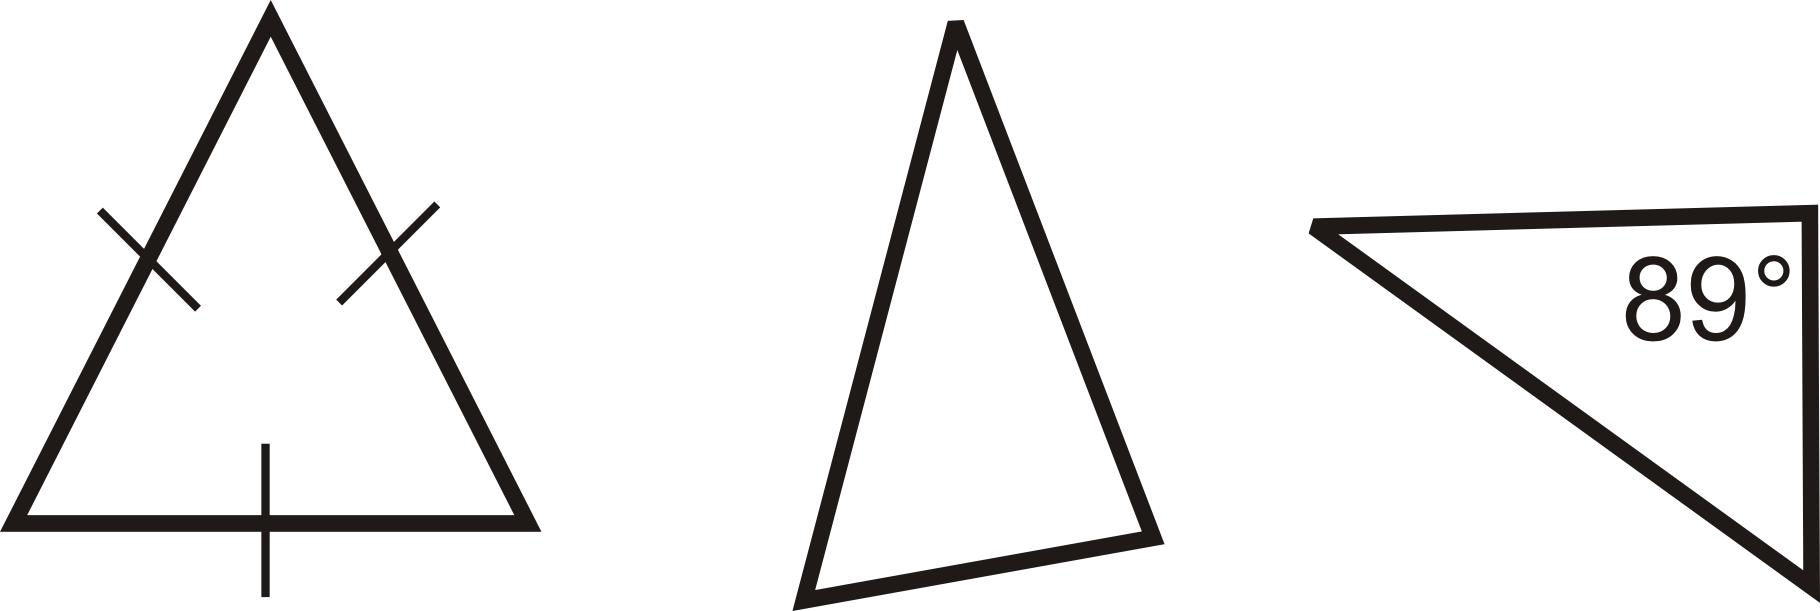 equiangular scalene triangle - photo #39